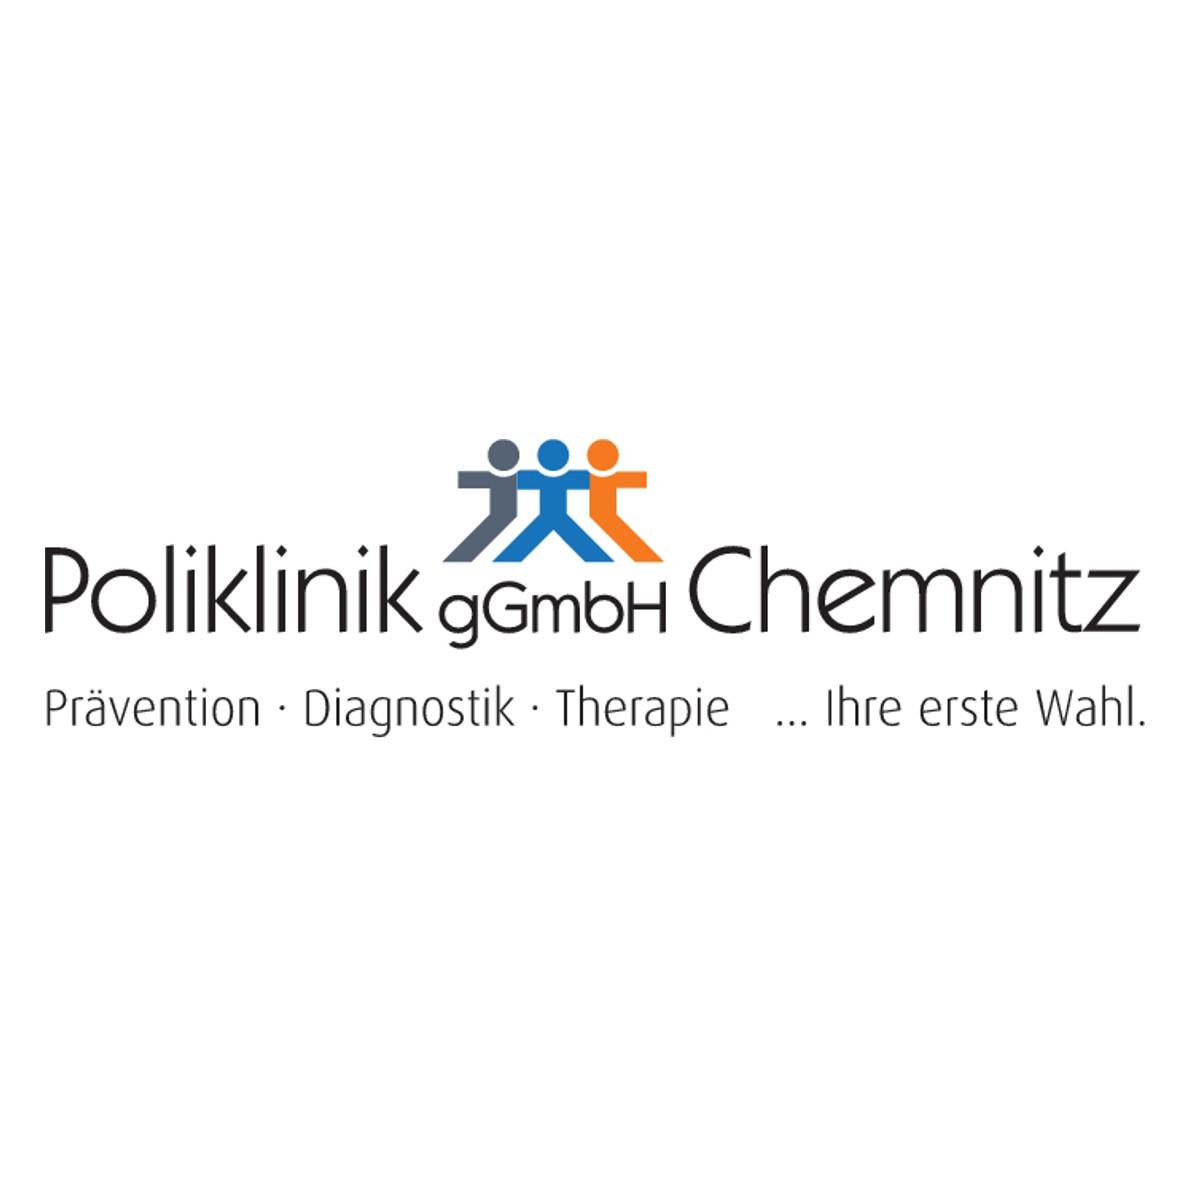 poliklinik ggmbh chemnitz chemnitz zieht an. Black Bedroom Furniture Sets. Home Design Ideas